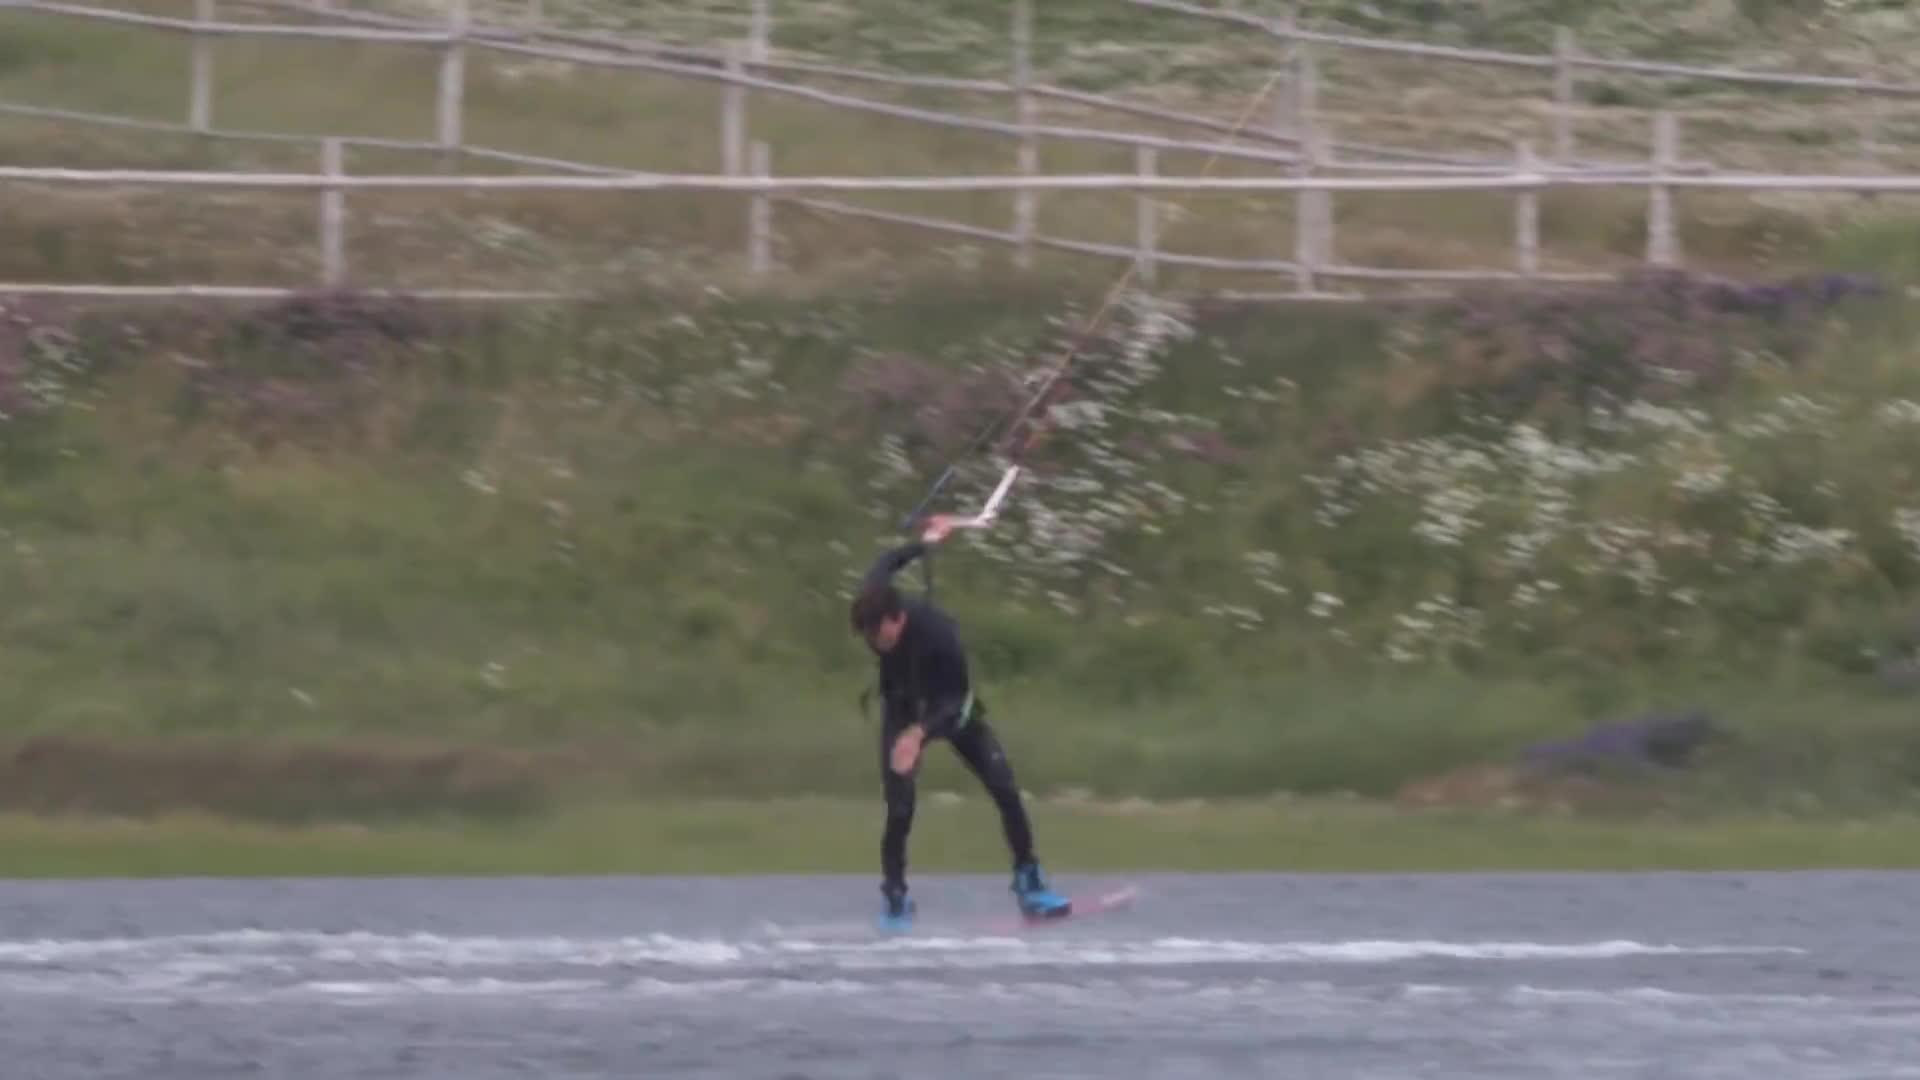 kite surfing, kitesurf, kitesurfen, Kiteboarding is Awesome 2017 #3 GIFs